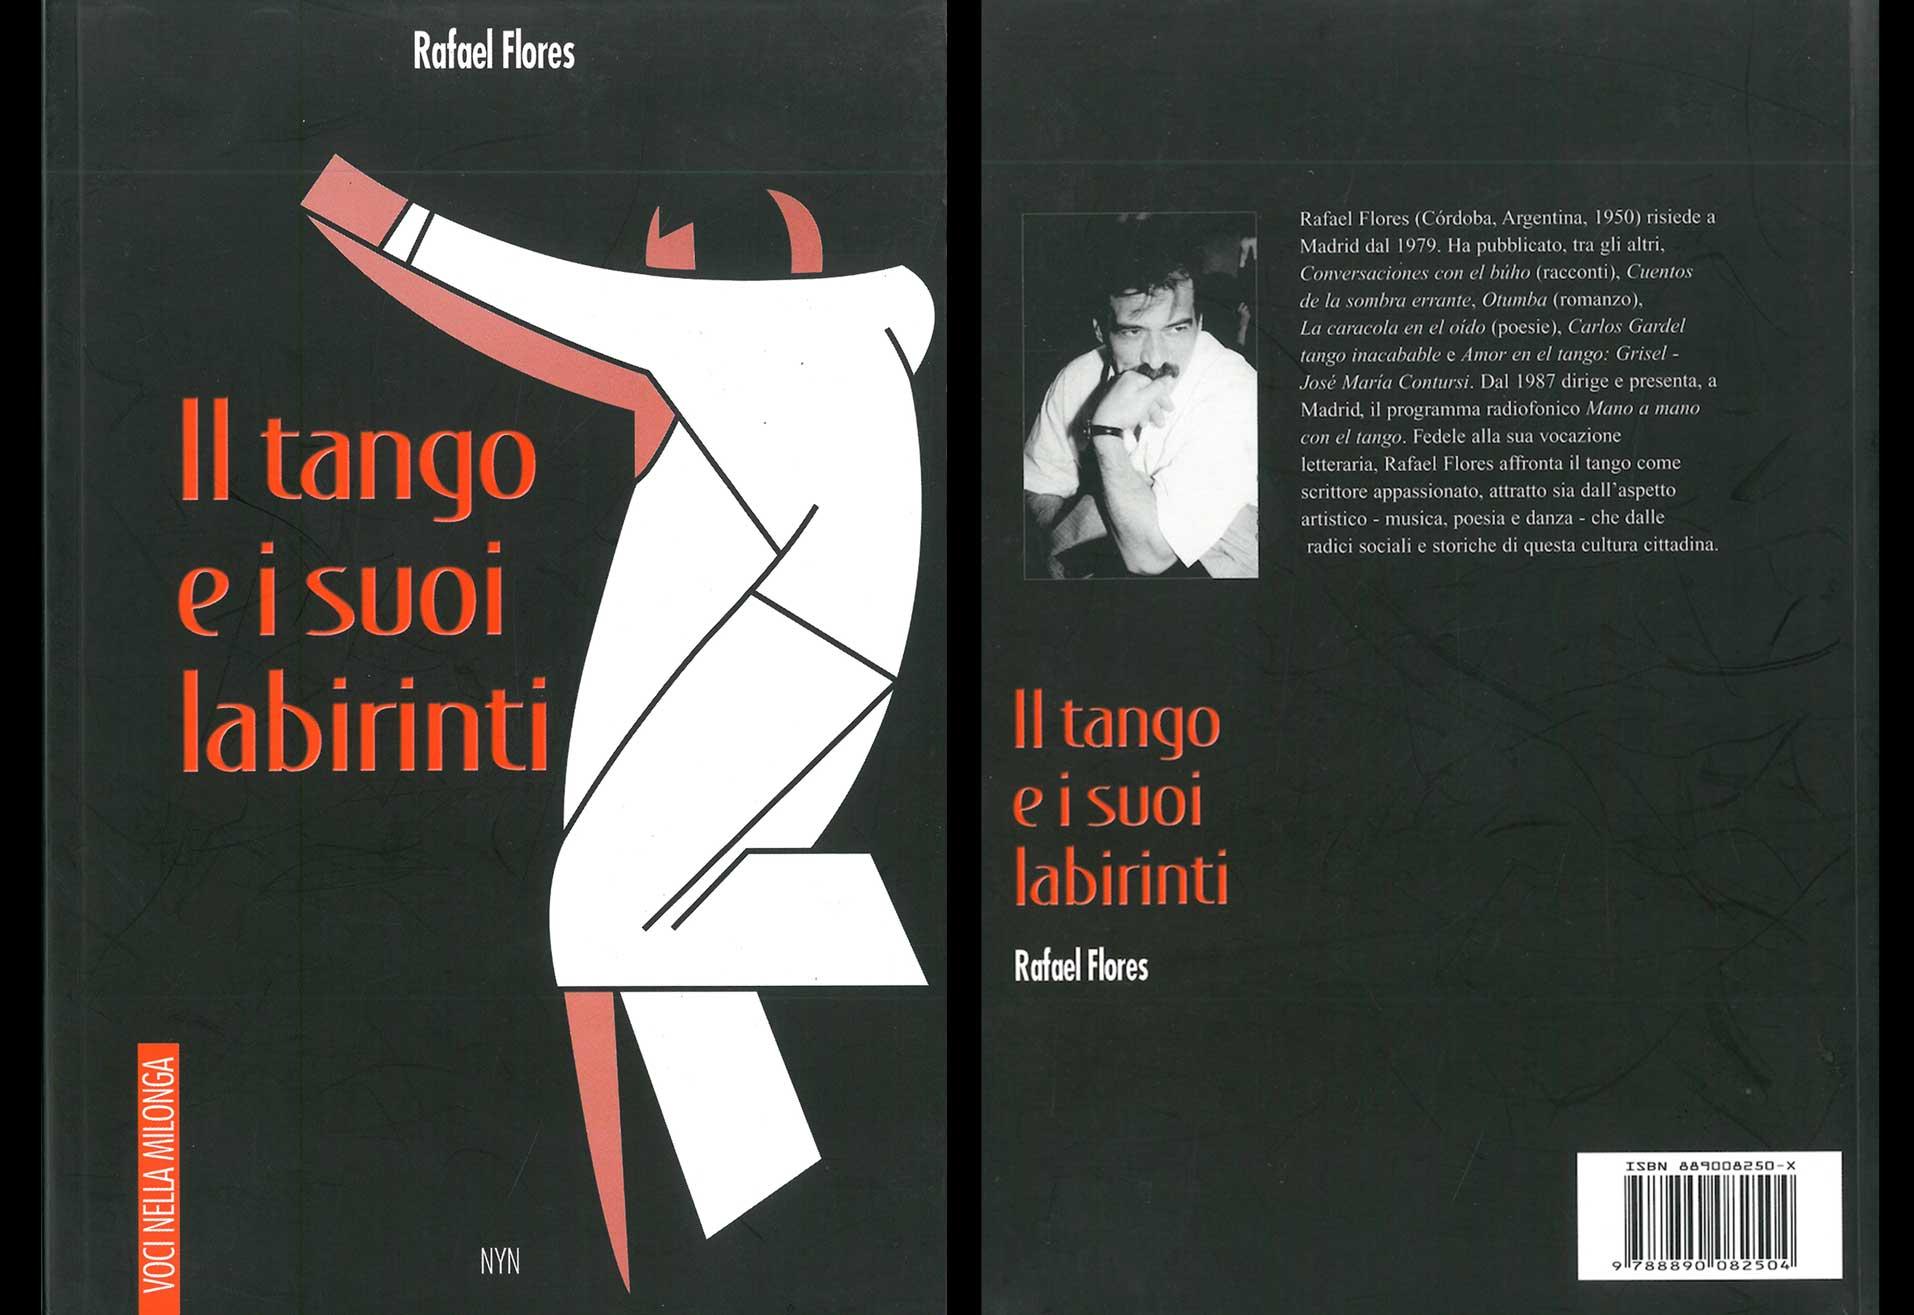 06_Il-tango-e-i-soui-labirinti